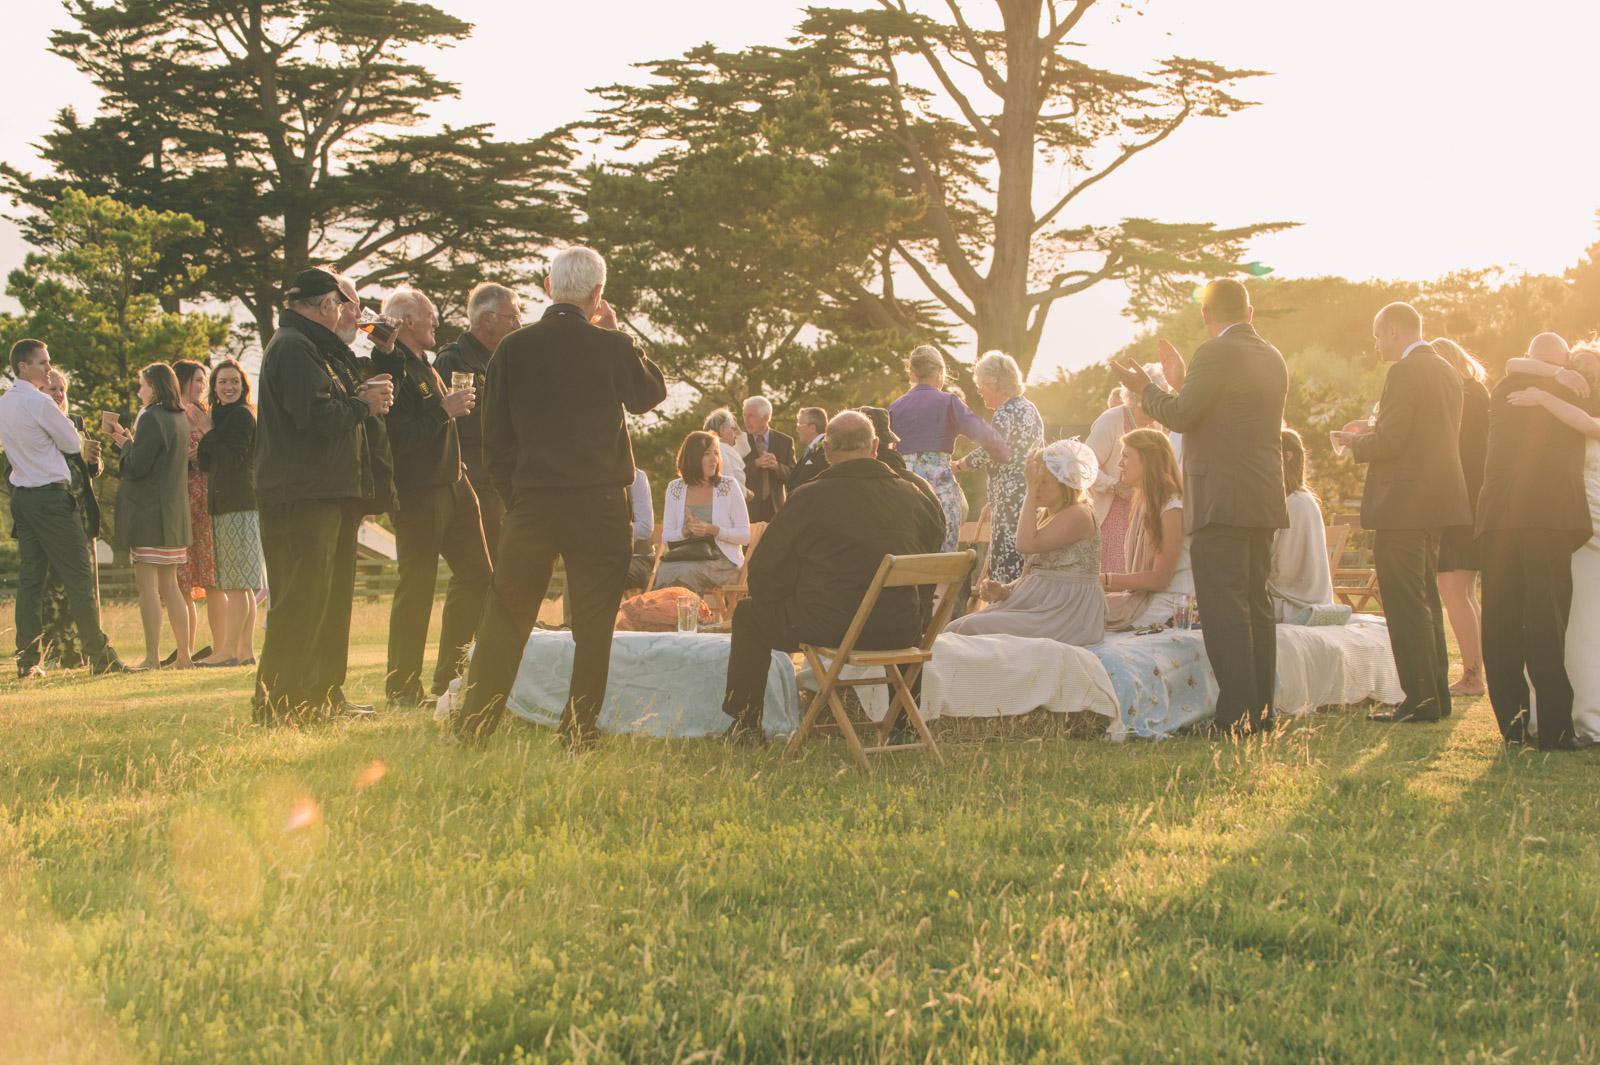 wedding-photography-rock-174.jpg